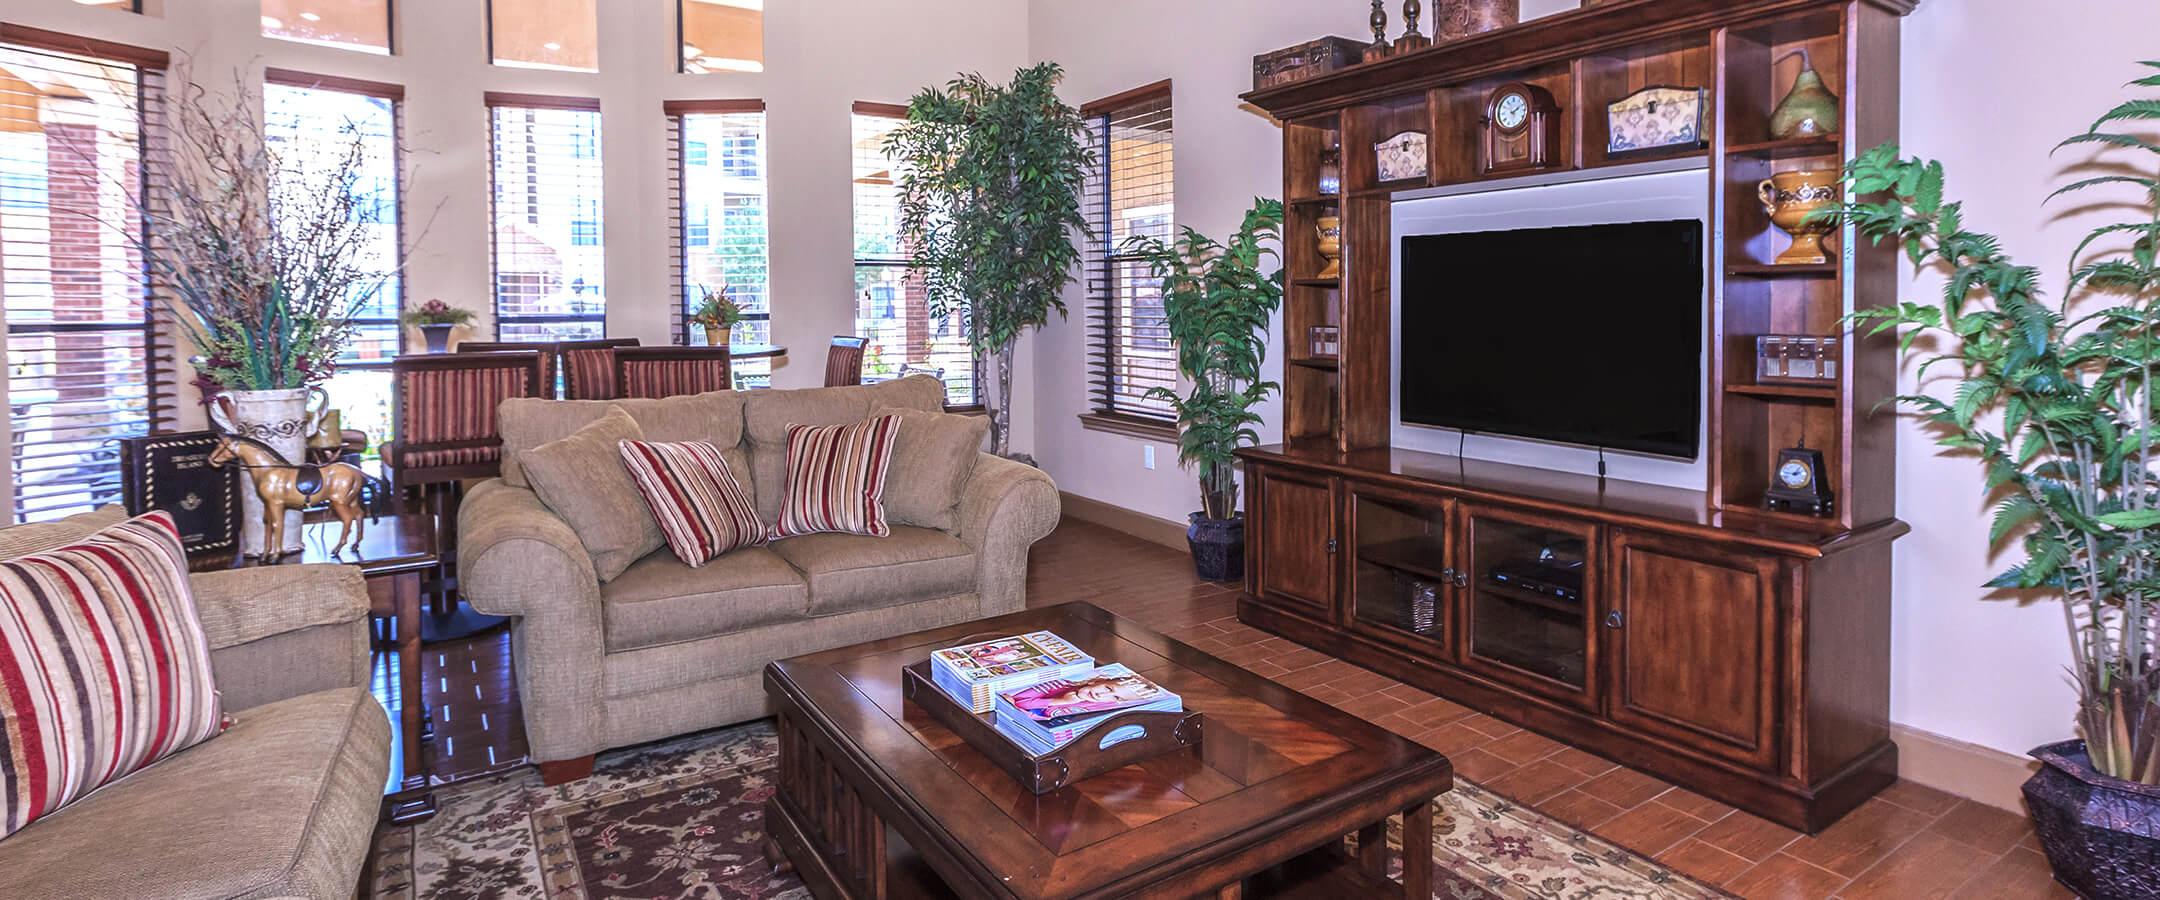 Quintessa Homes Houston Reviews